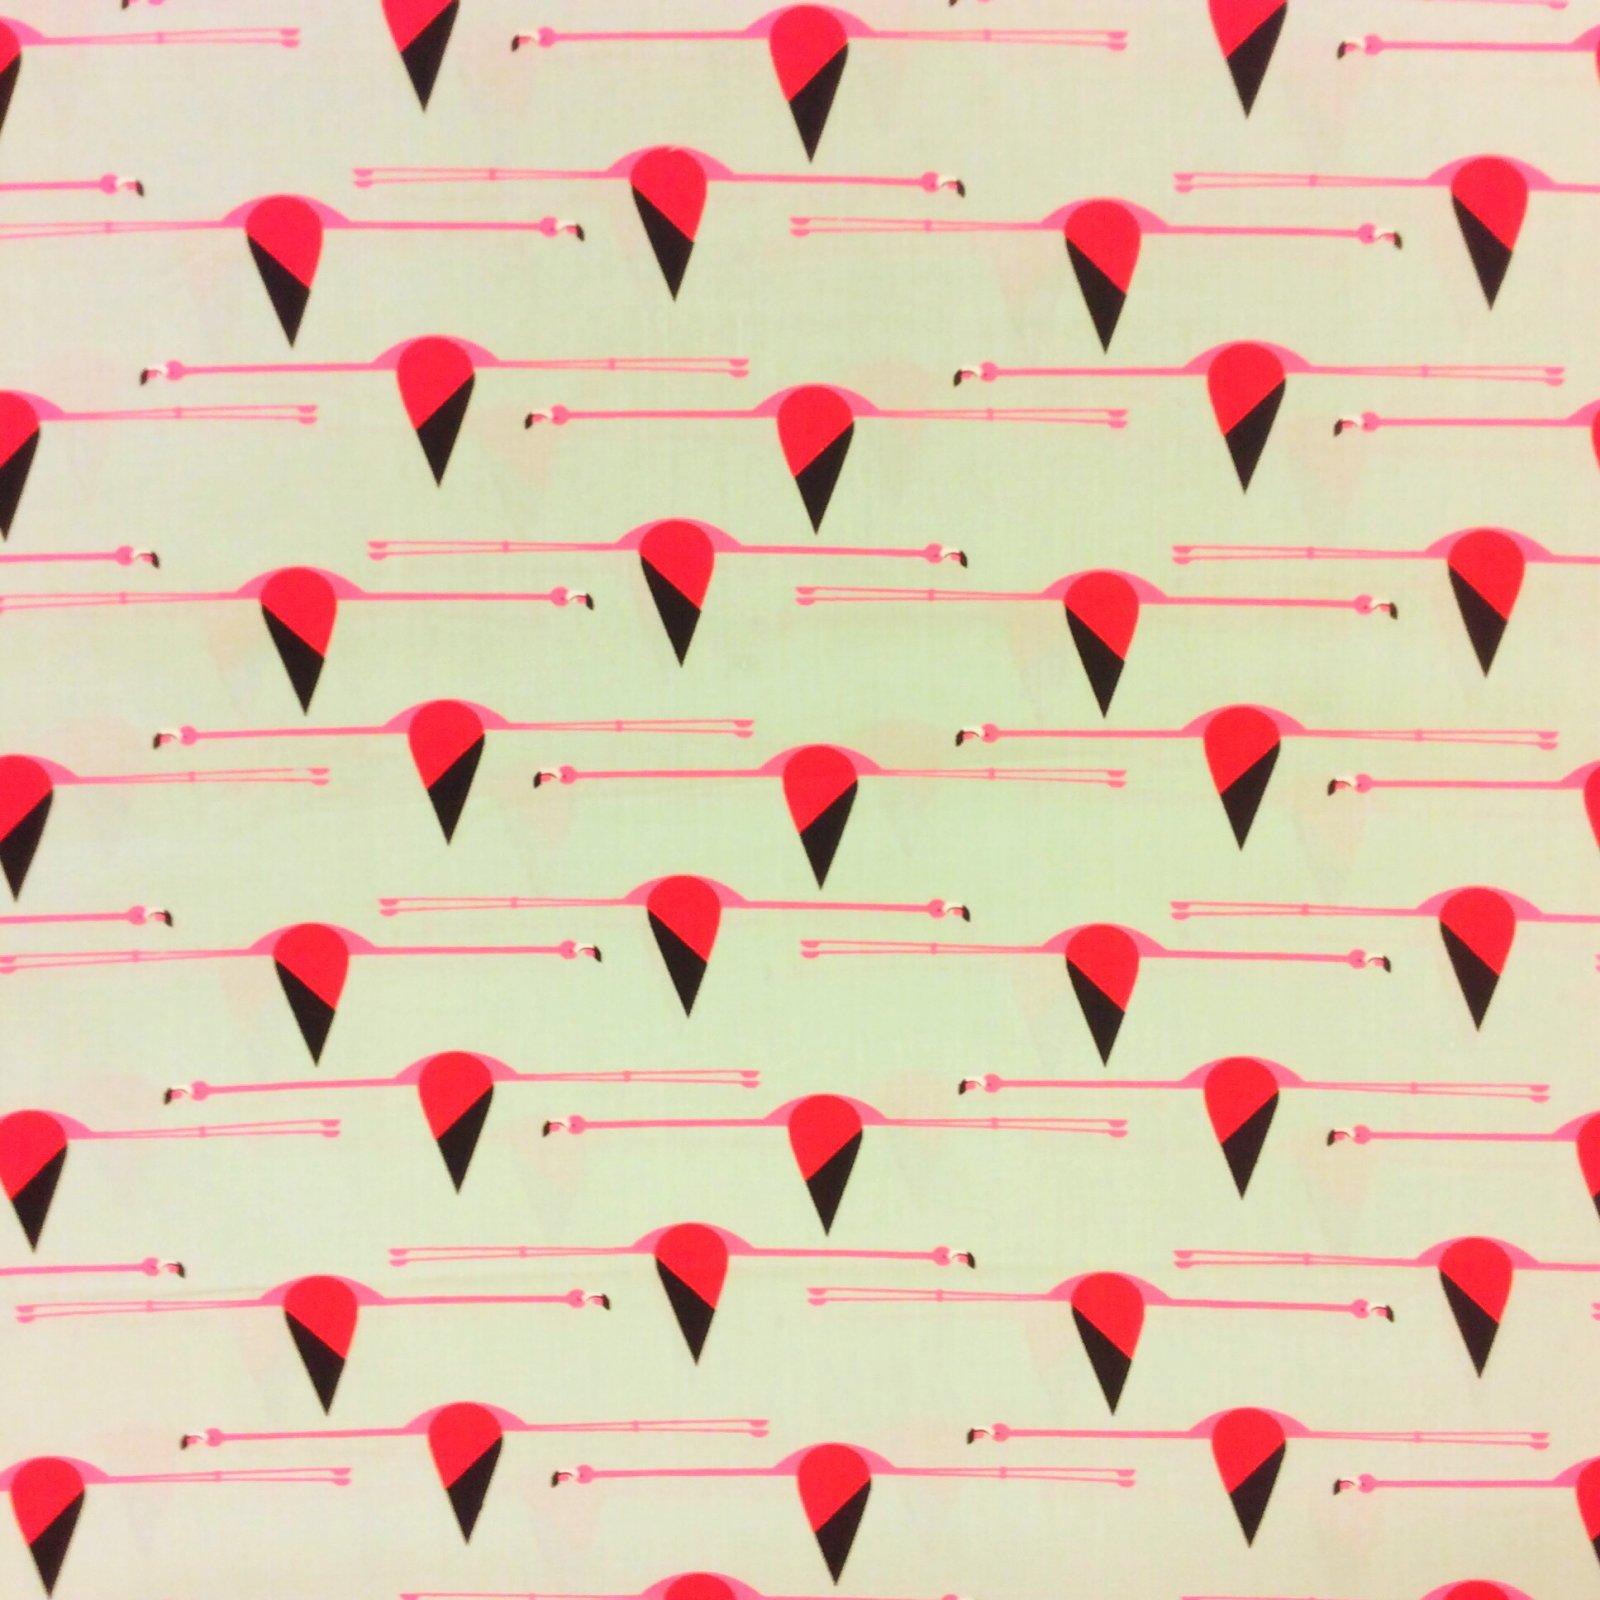 Charley Harper Flamingo Fantasy Bird Flight Pink 50's Cotton Fabric CHB51